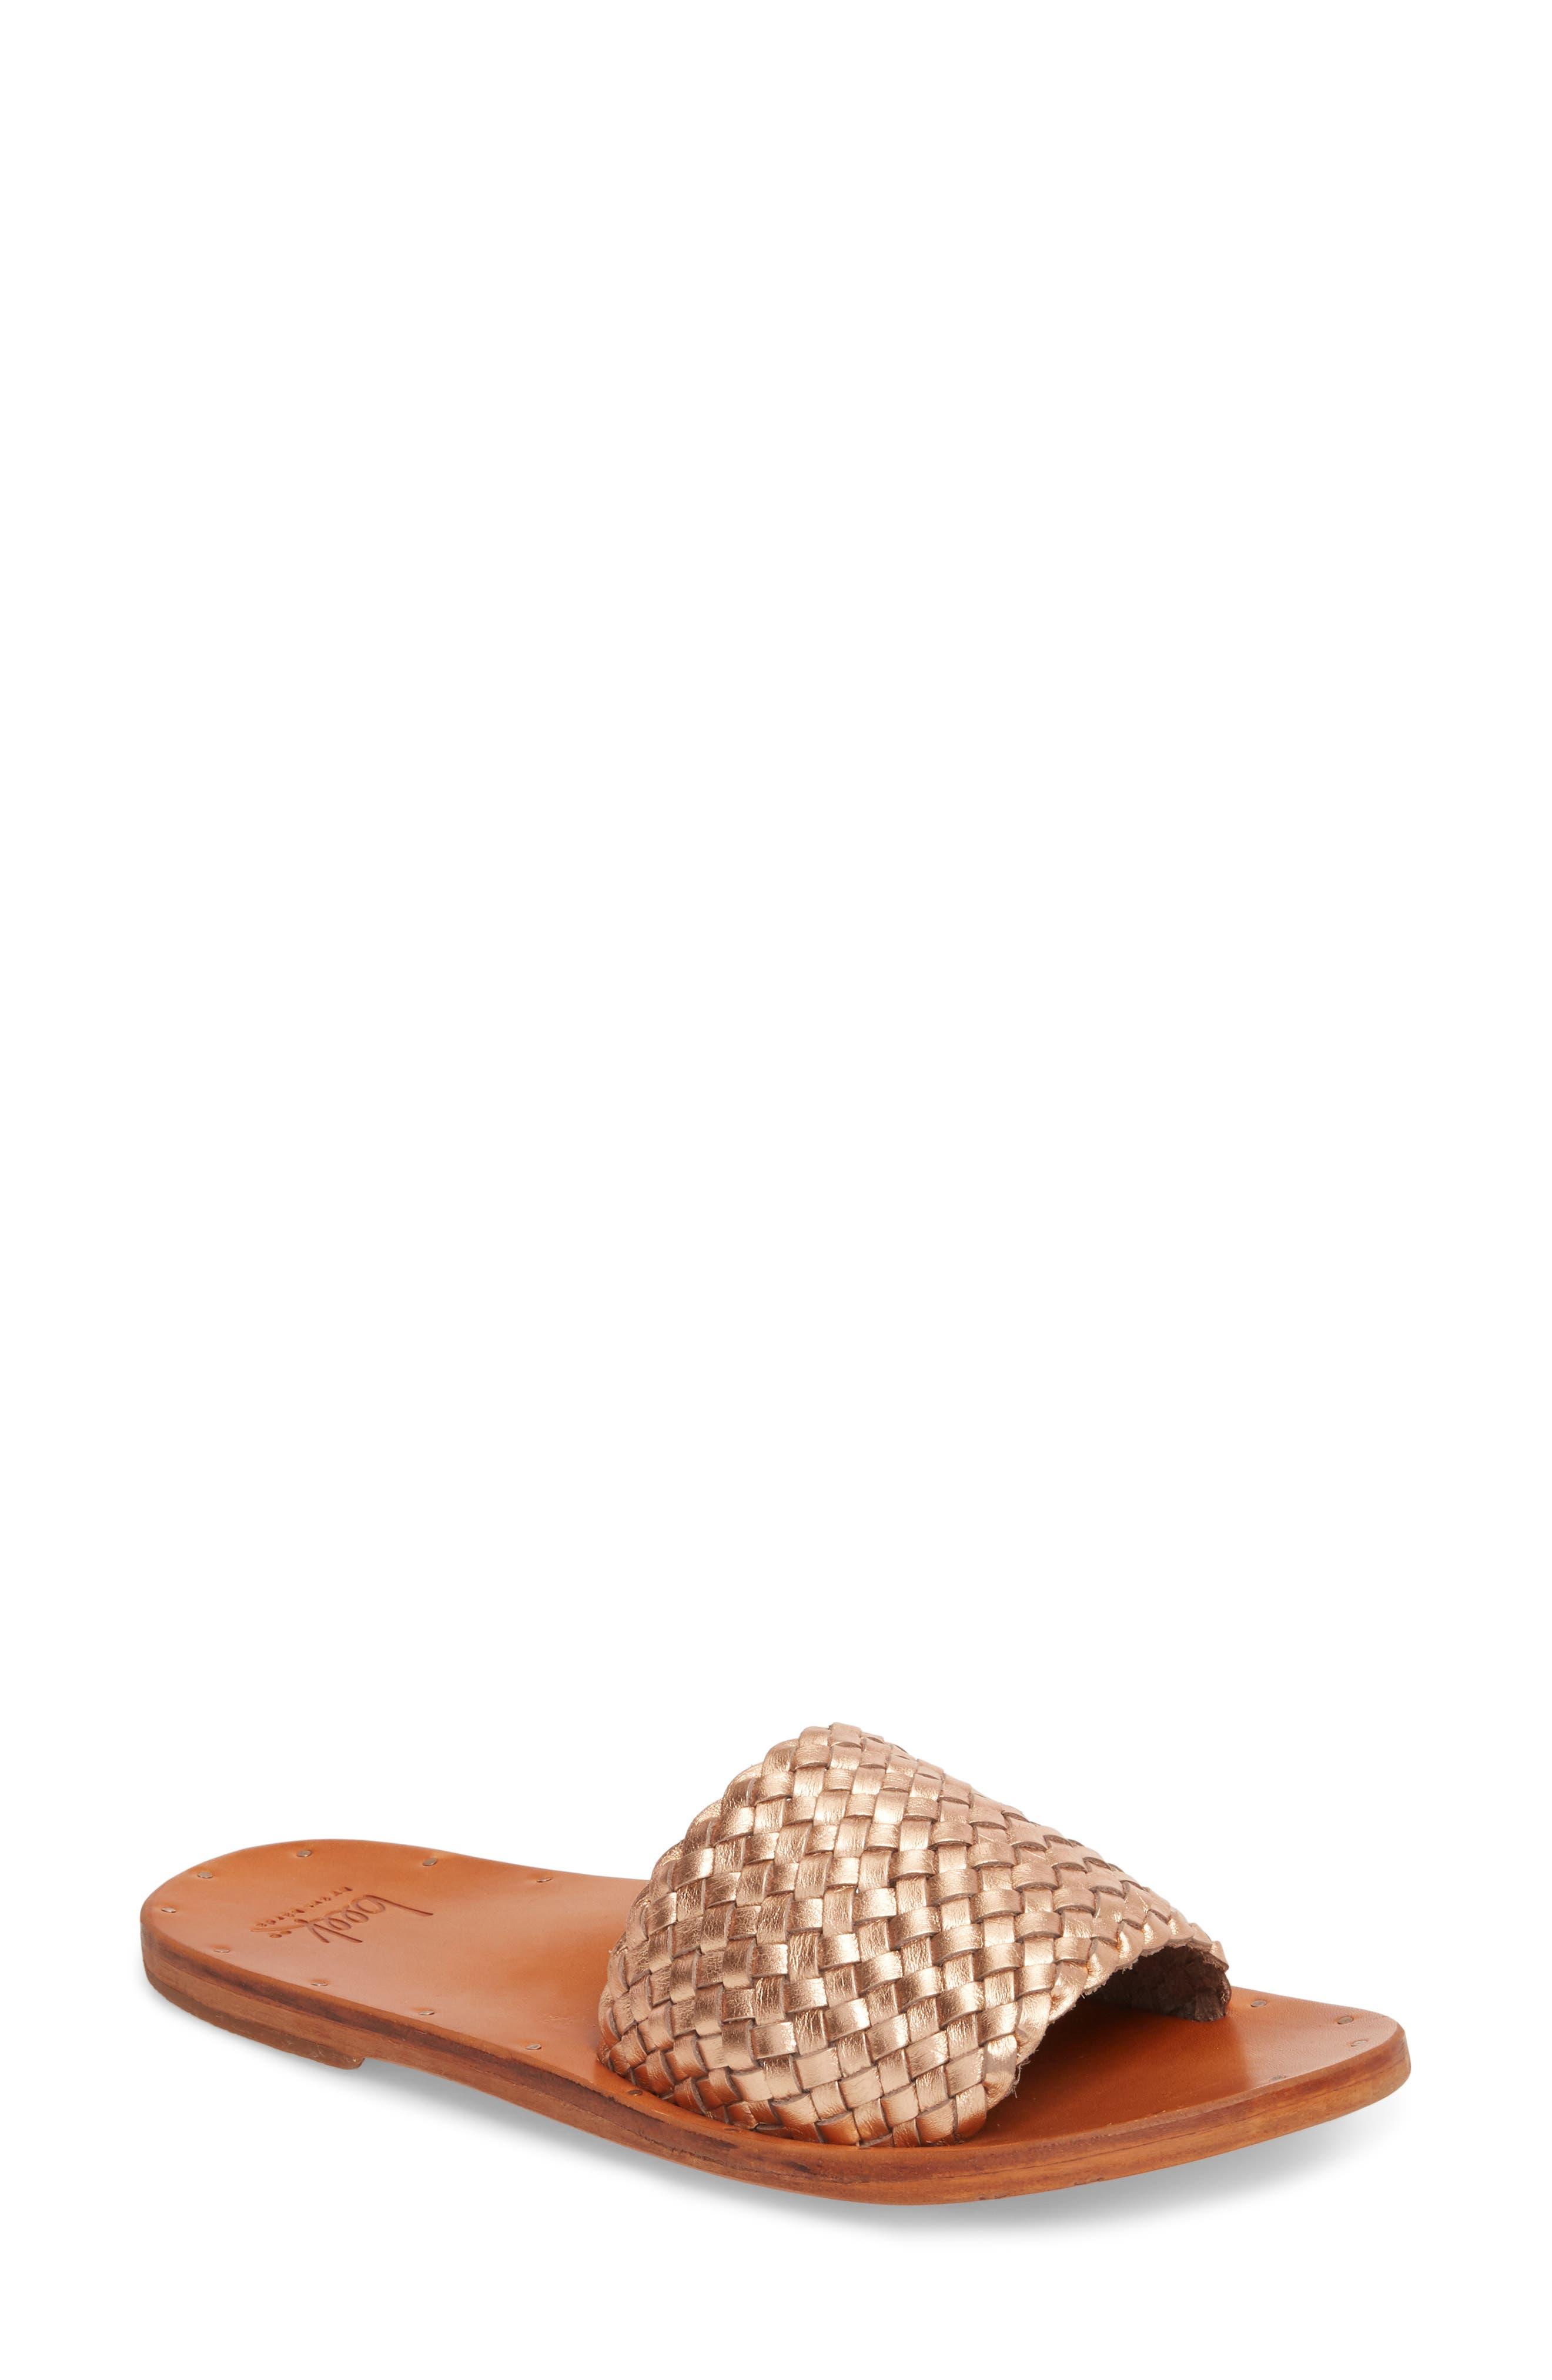 Osprey Woven Slide Sandal,                             Main thumbnail 1, color,                             710